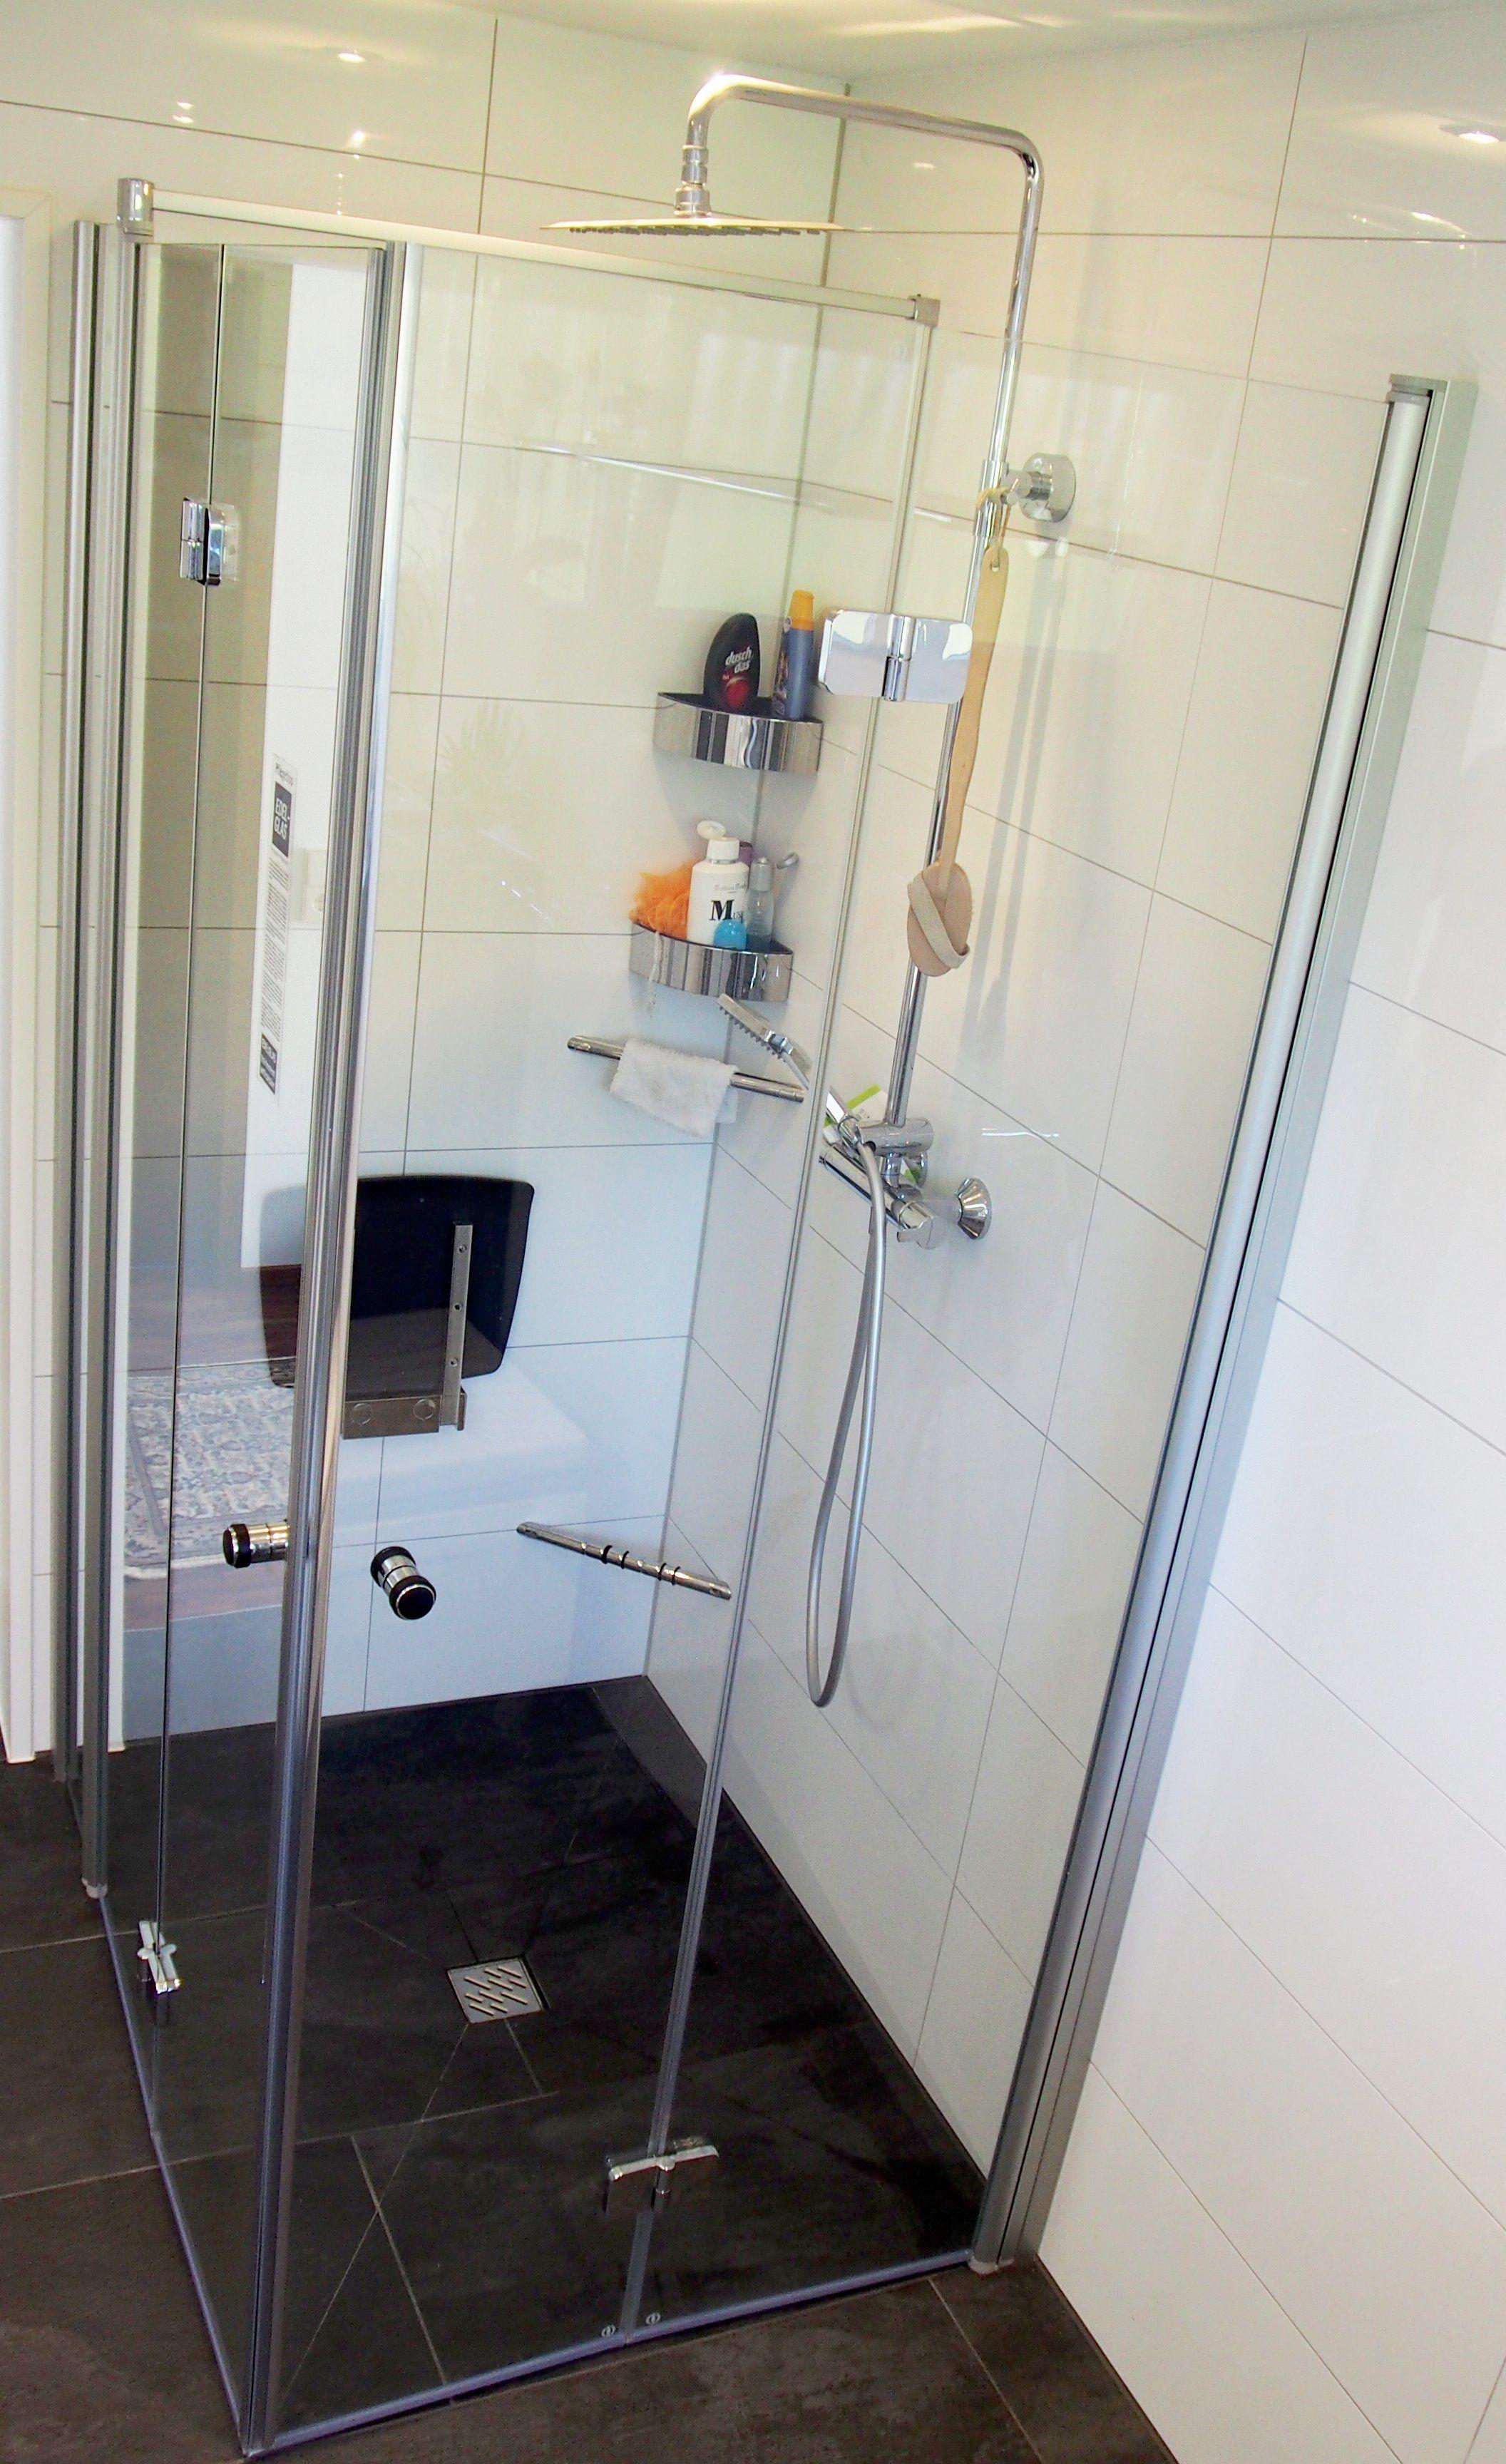 Seniorengerechtes Bad In Naturtonen Duschsitz Dusche Badezimmer